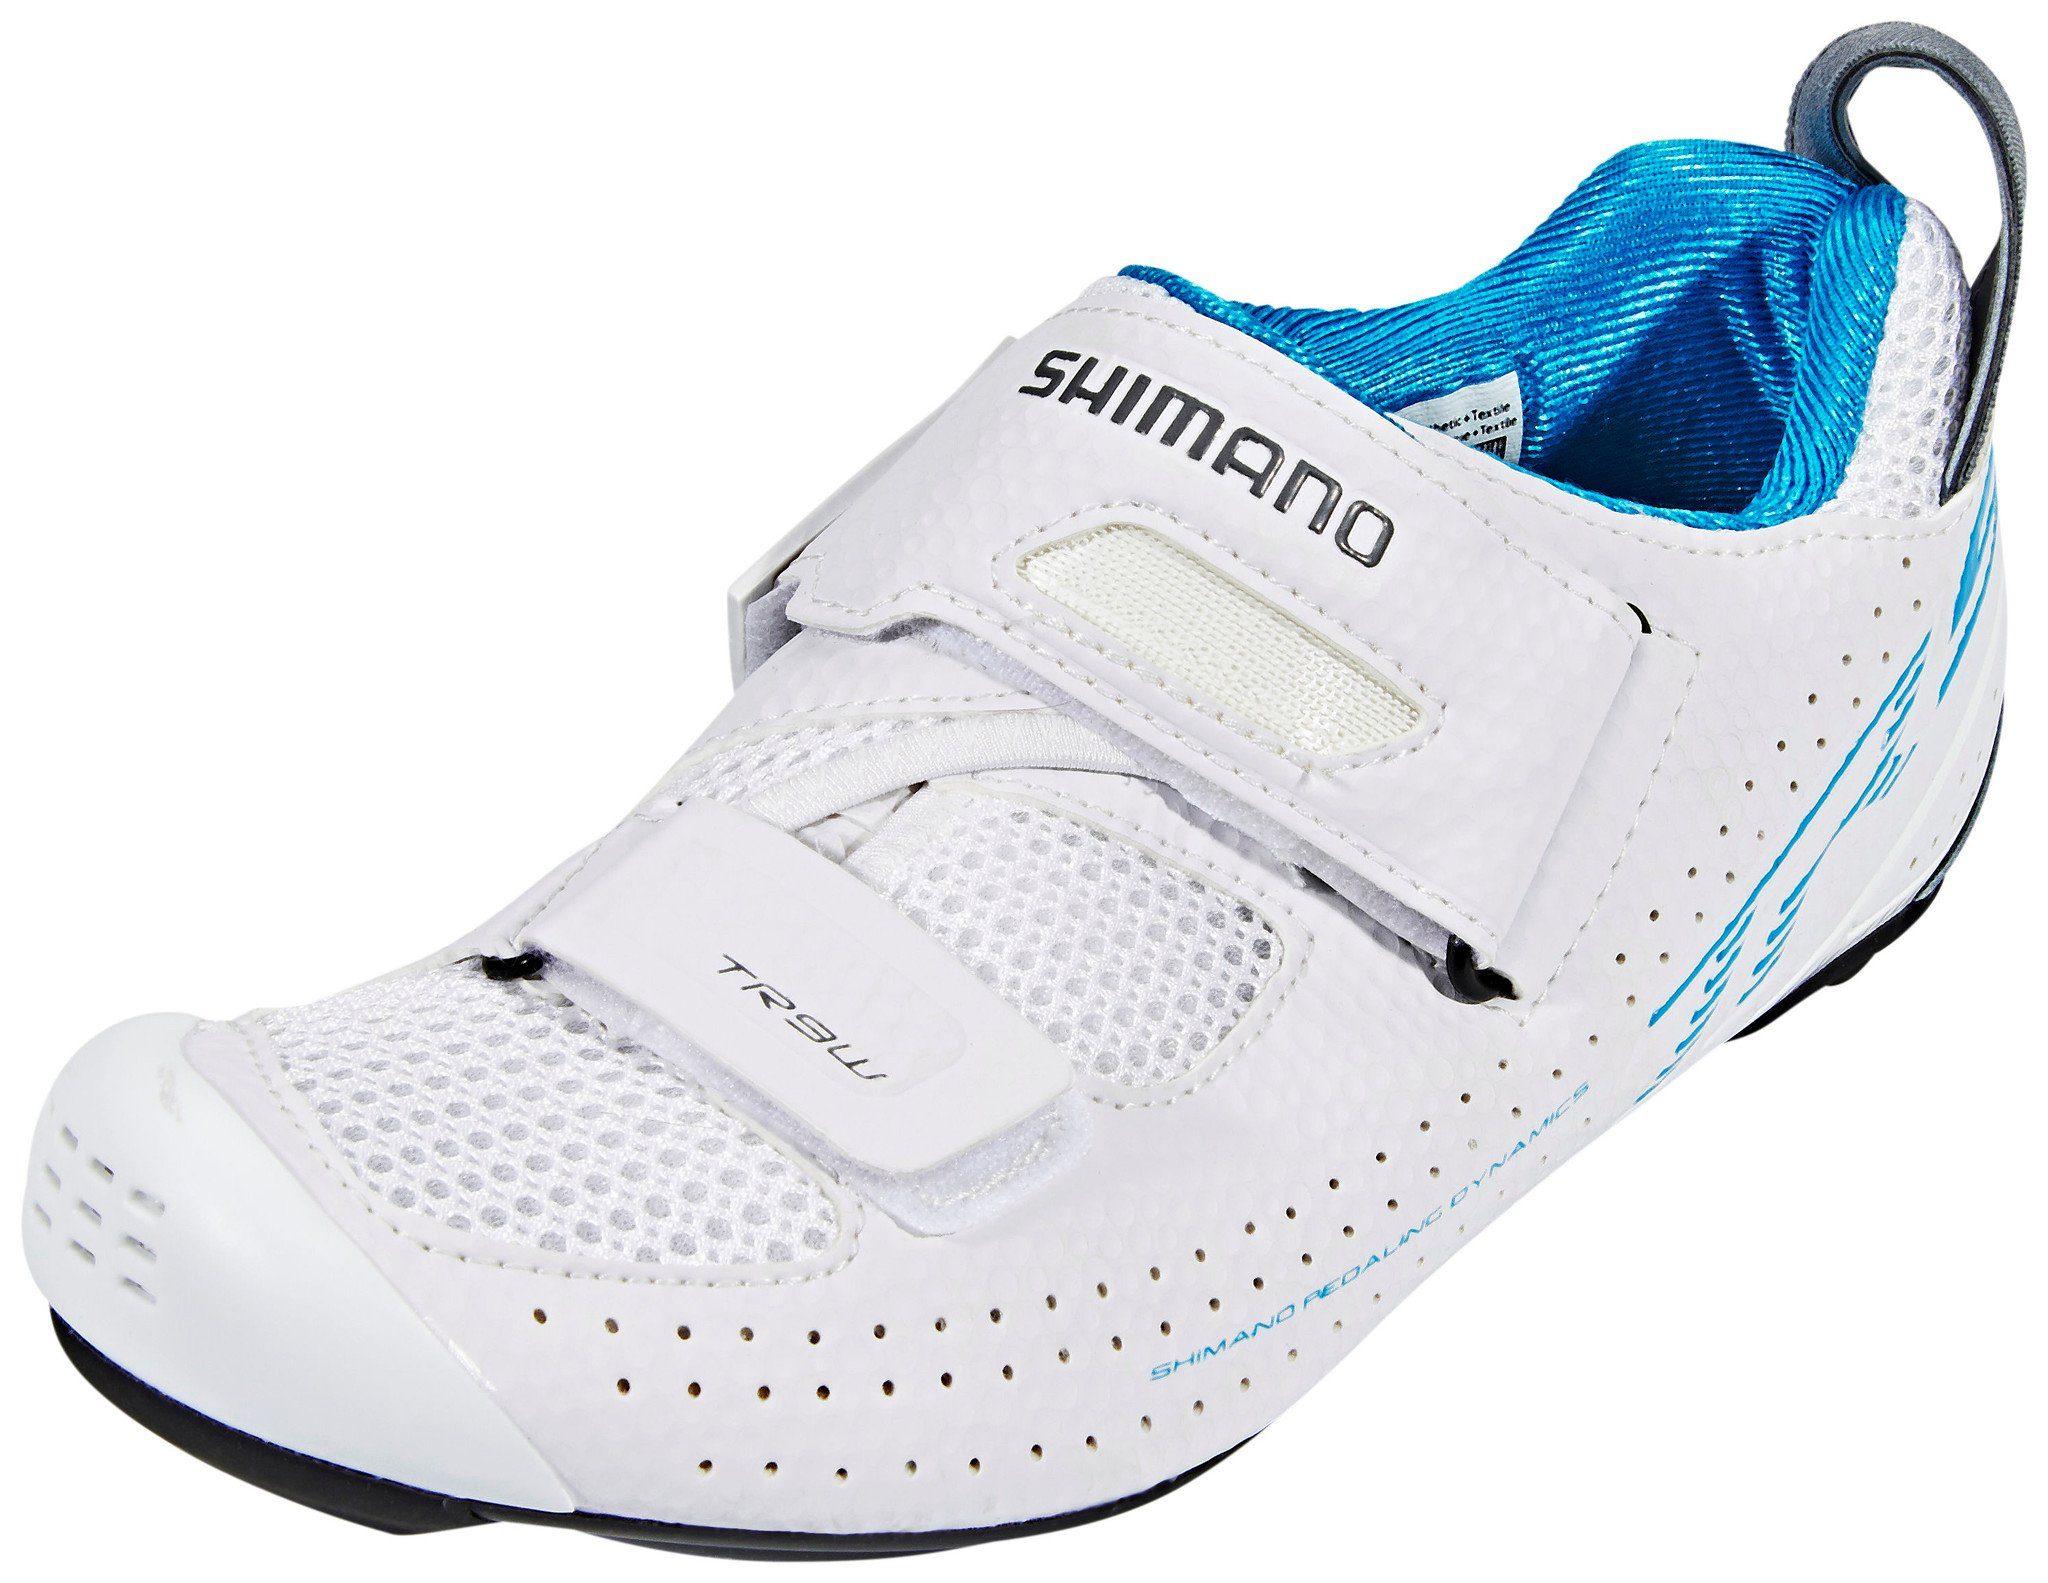 Shimano Fahrradschuh SH-TR9 Schuhe Damen kaufen  weiß